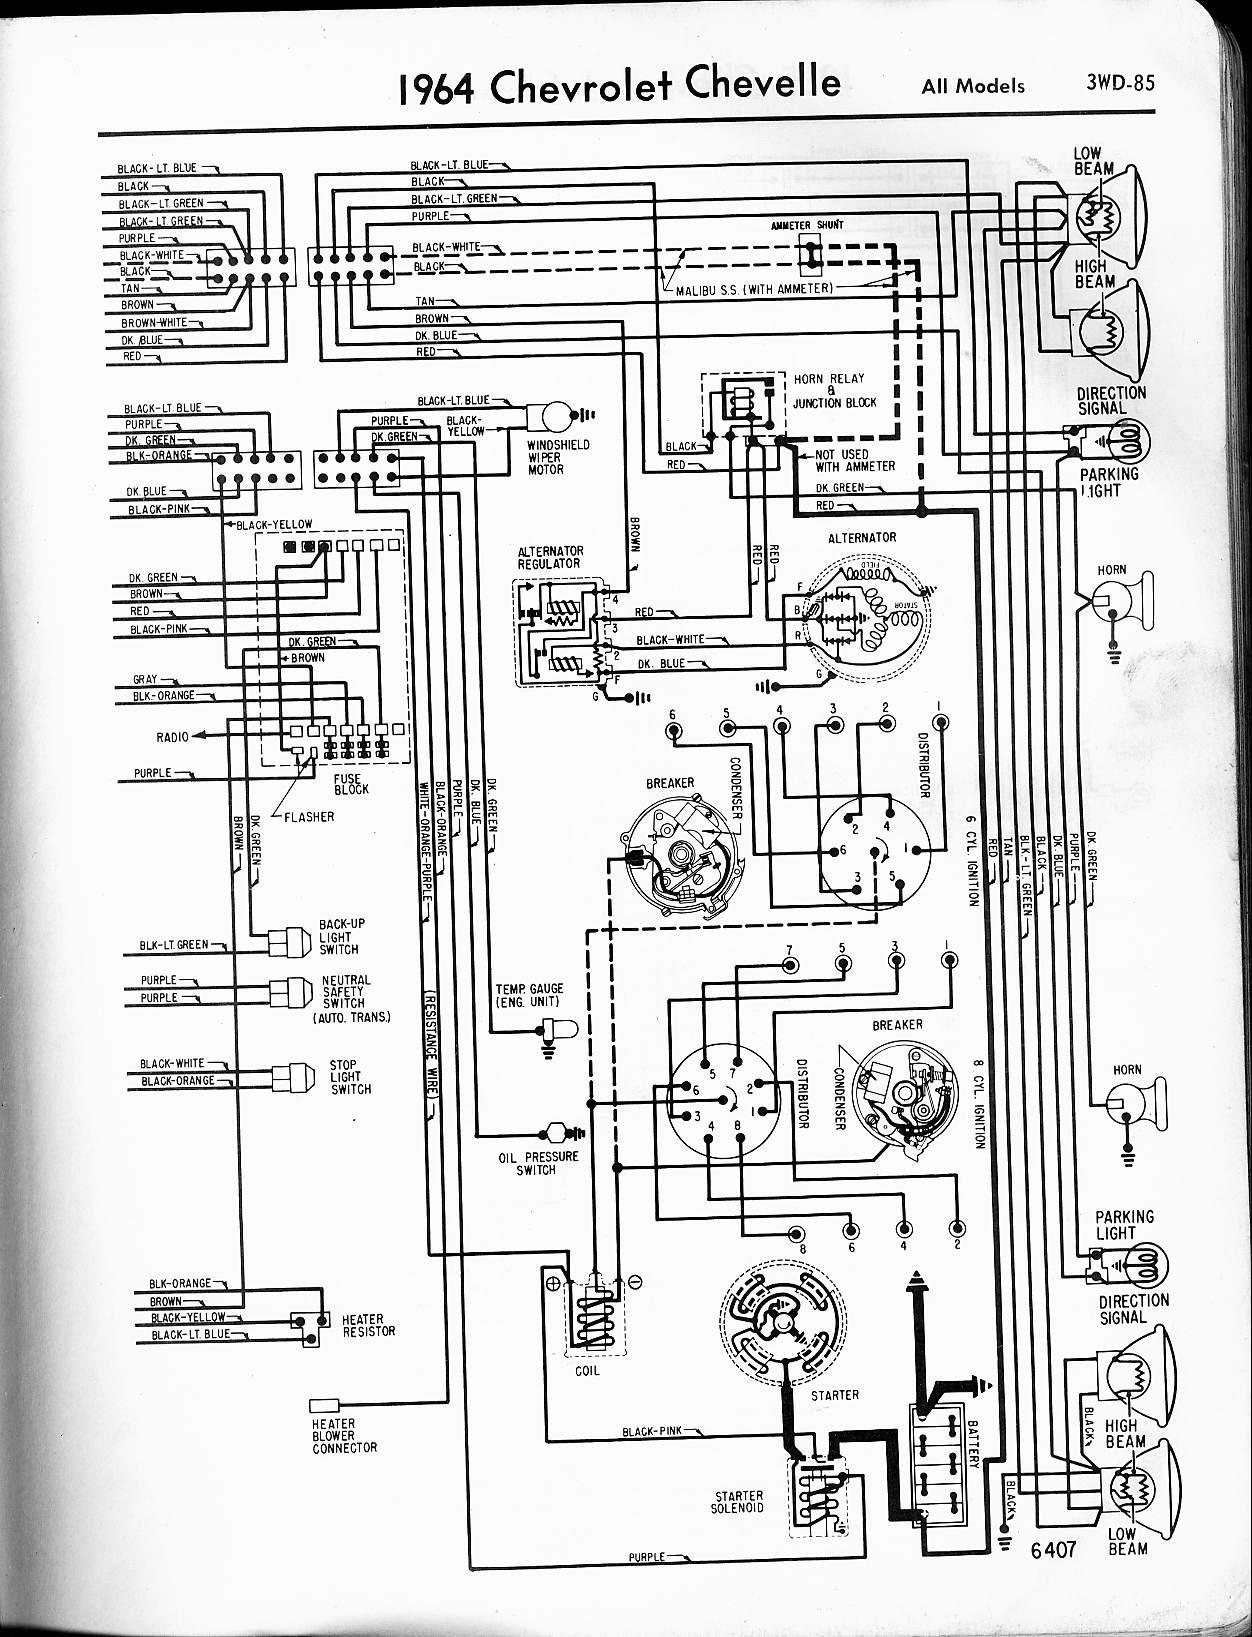 Wiring Diagram Also 1970 Chevelle Wiring Diagram On 1966 Chevy C10 ...